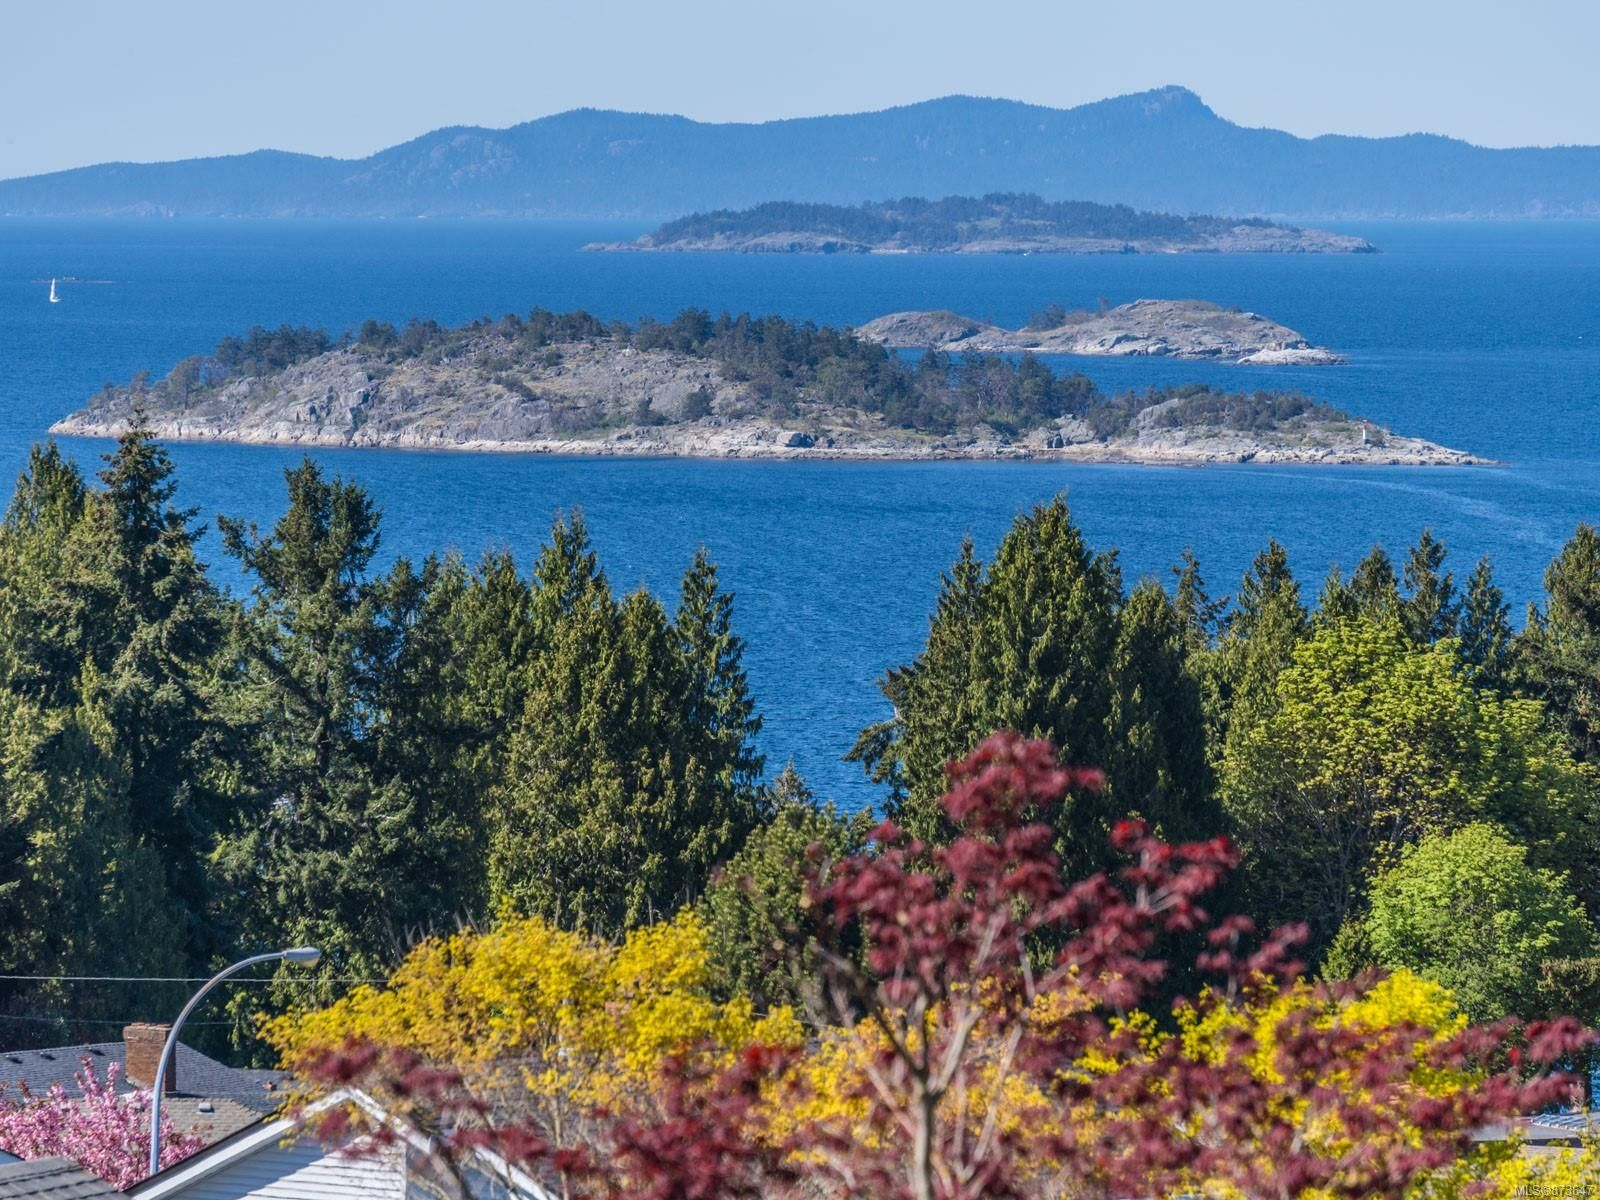 Main Photo: 6618 Groveland Dr in : Na North Nanaimo House for sale (Nanaimo)  : MLS®# 873647